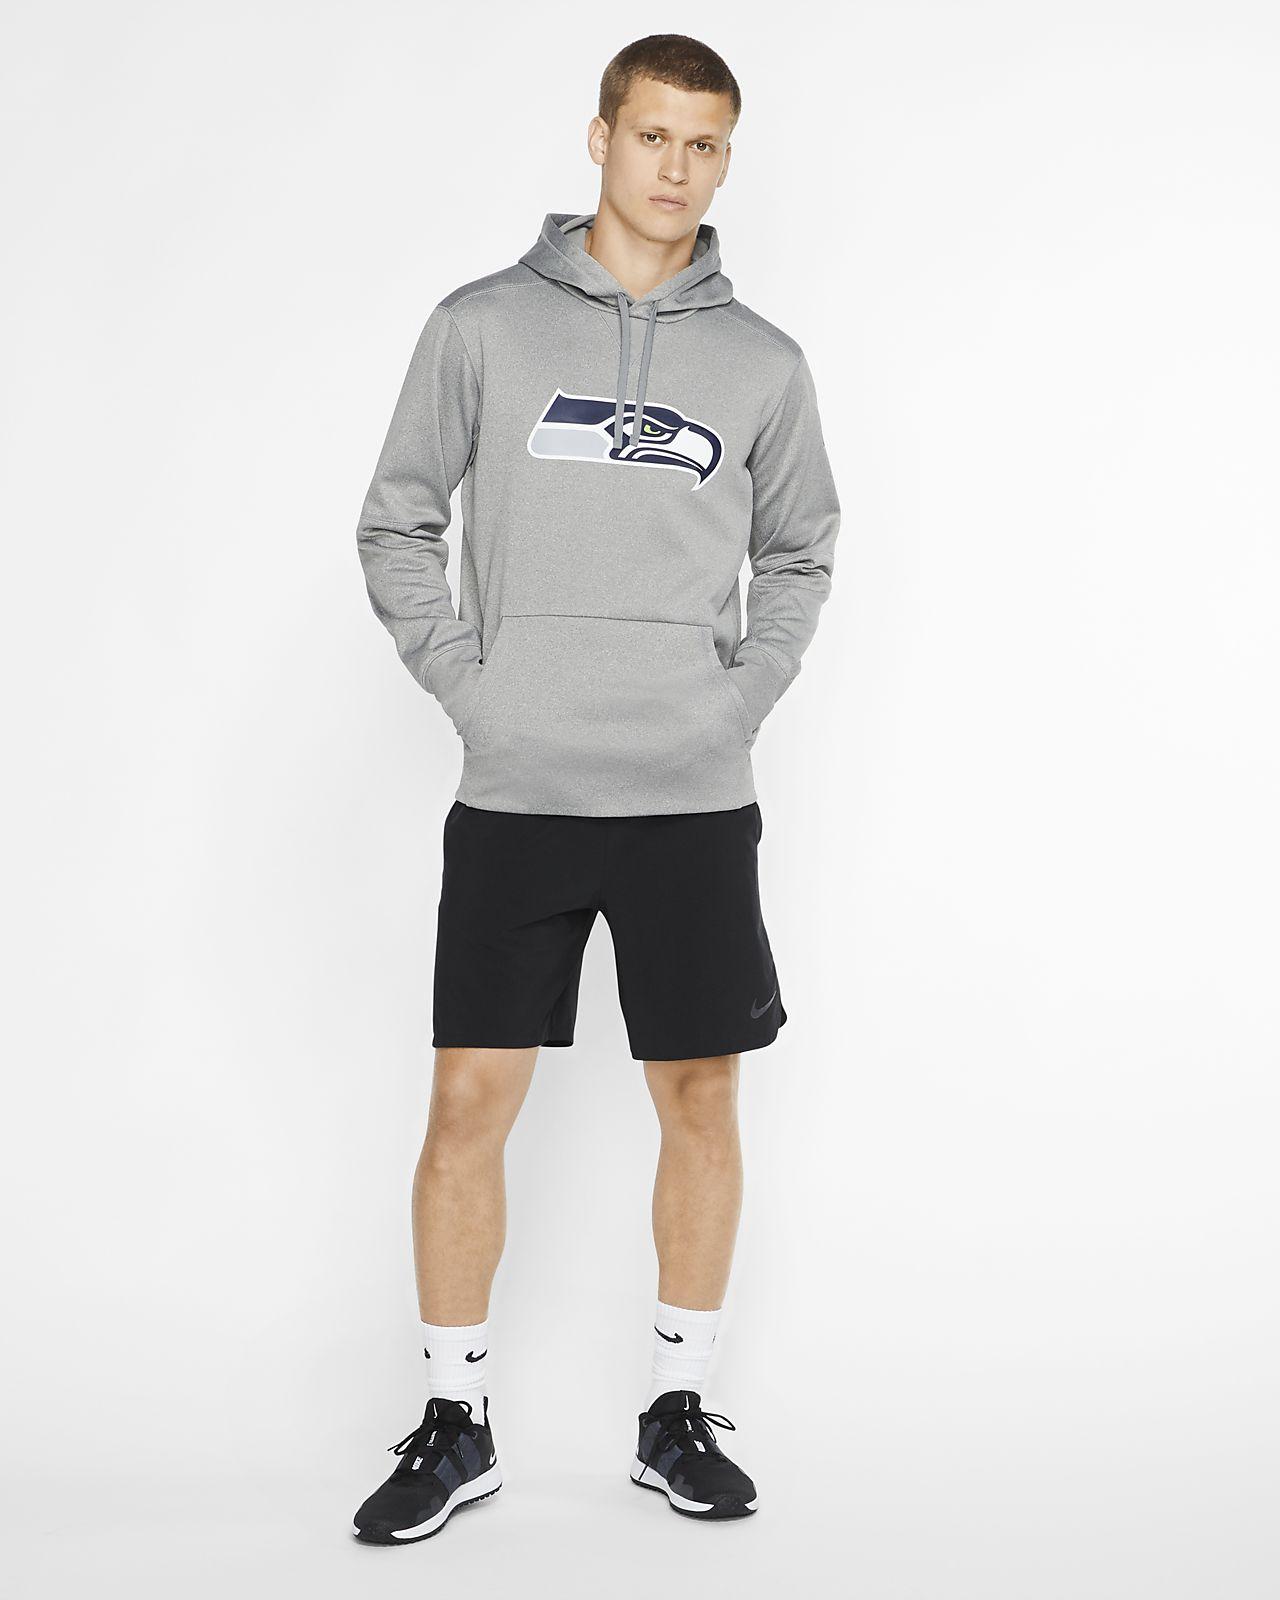 Felpa pullover con cappuccio Nike Circuit Logo Essential (NFL Eagles) Uomo